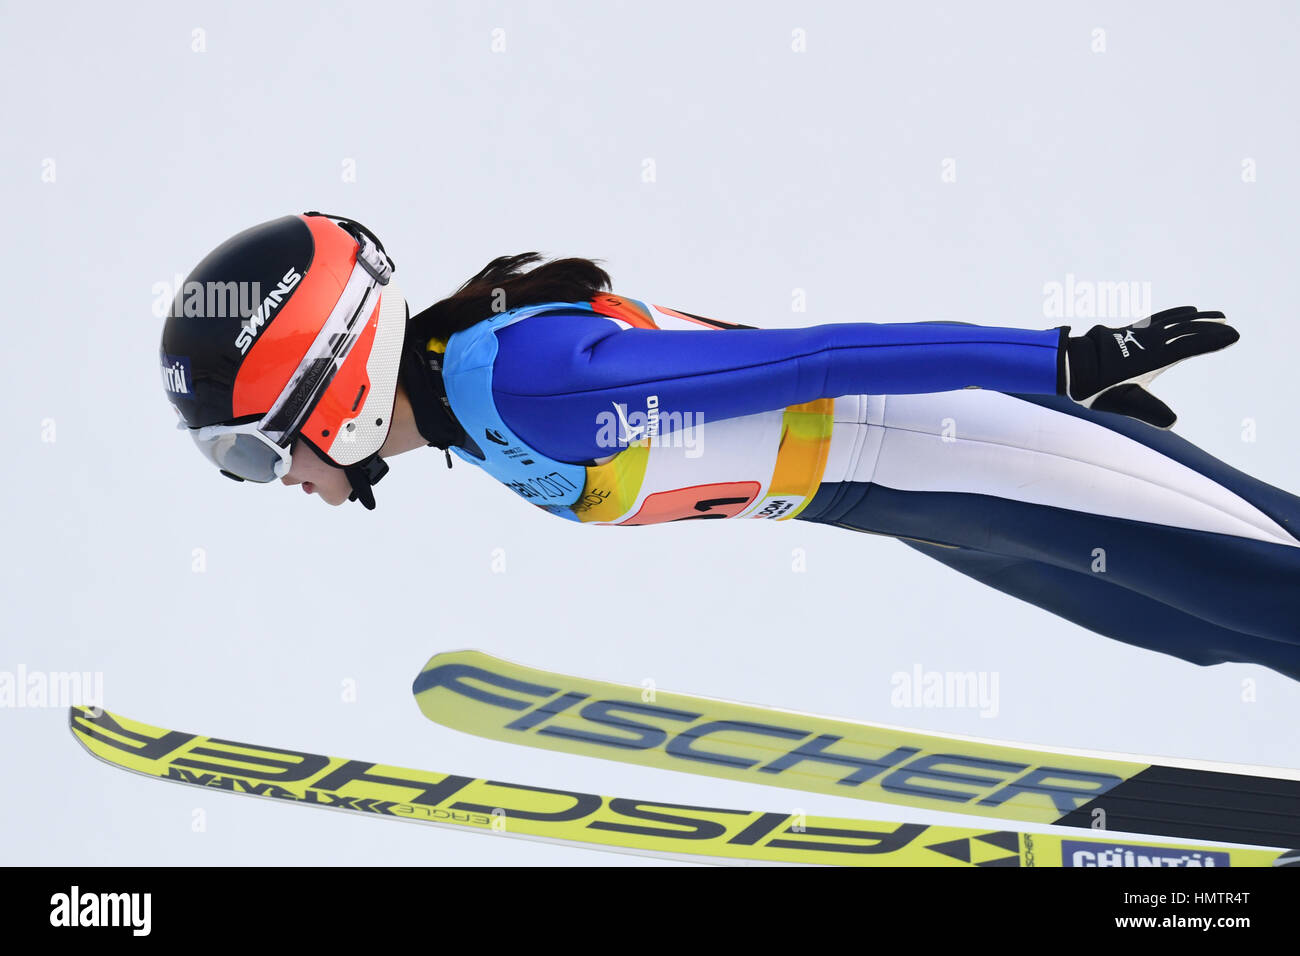 Almaty, Kasachstan. 5. Februar 2017. Yuka Kobayashi (JPN) auf den 28. Winter-Universiade Almaty 2017 Frauen Nationalmannschaft Stockfoto